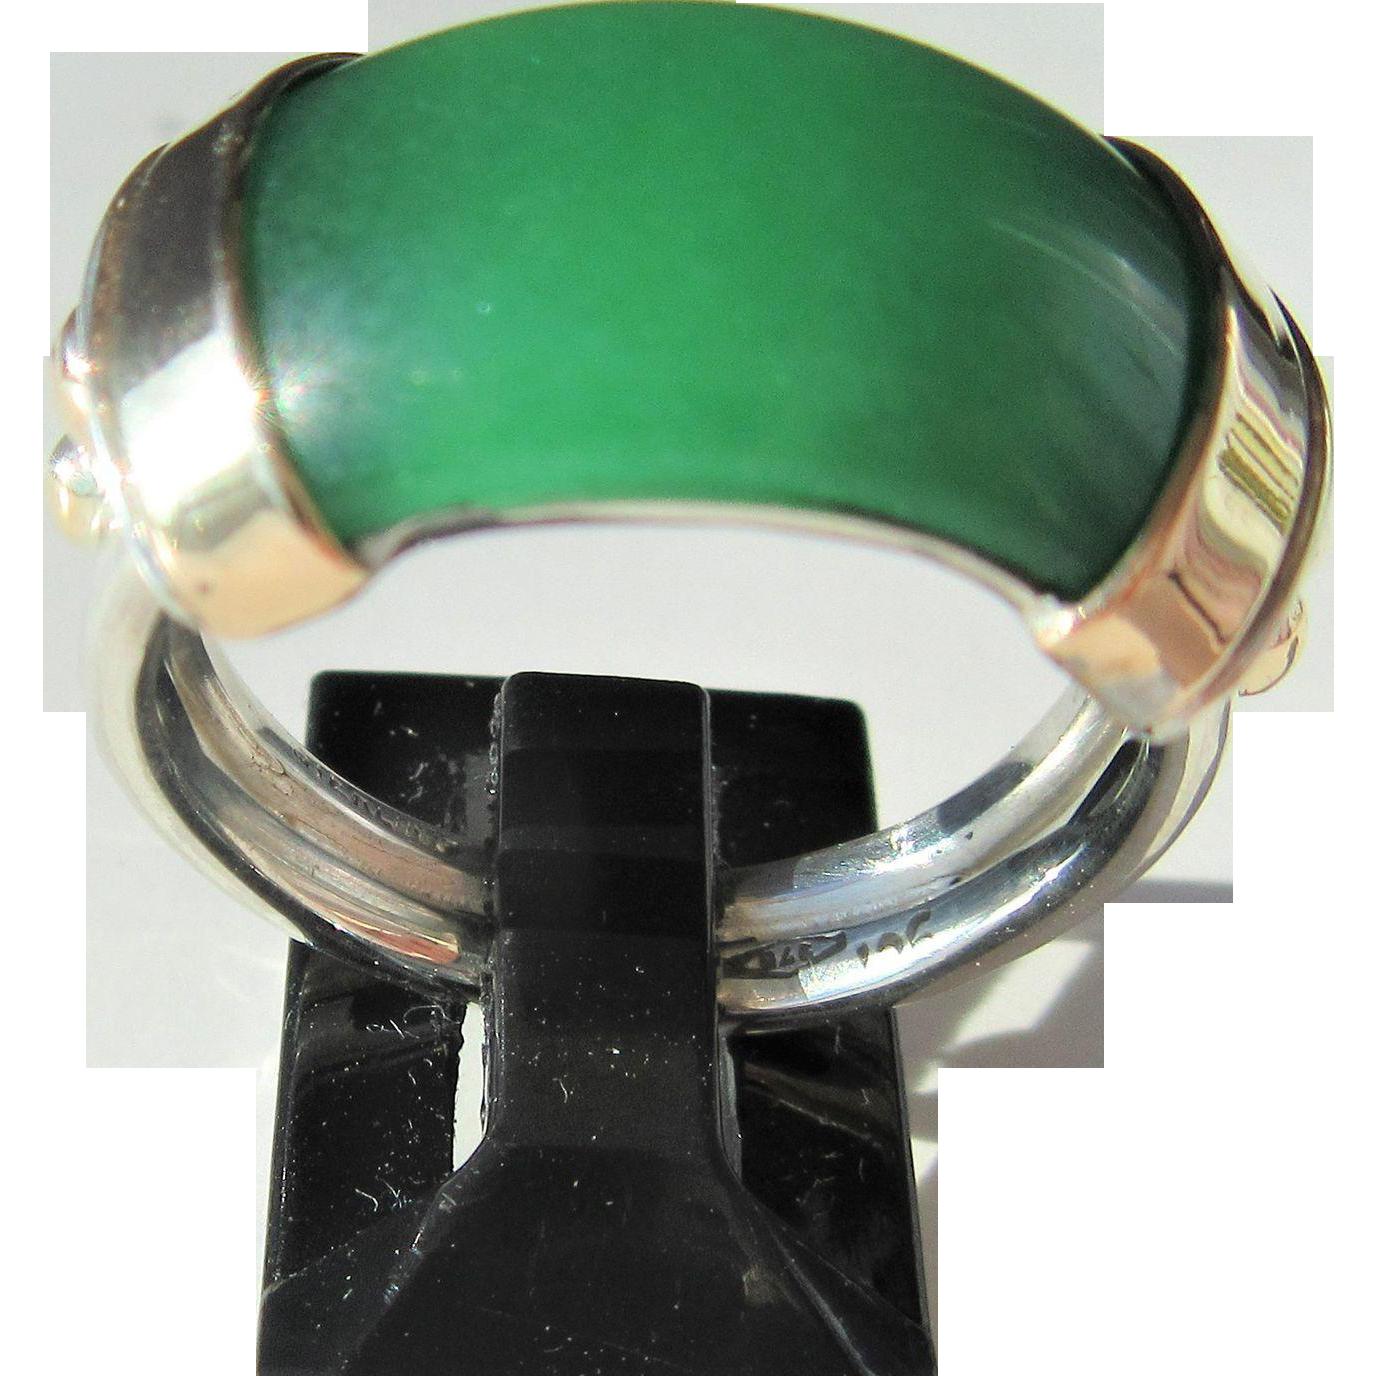 Jade, Silver Jade Ring, Silver/9kt Yellow Gold Jade Ring, Unisex Jade Ring, Jade Ring, Artisan